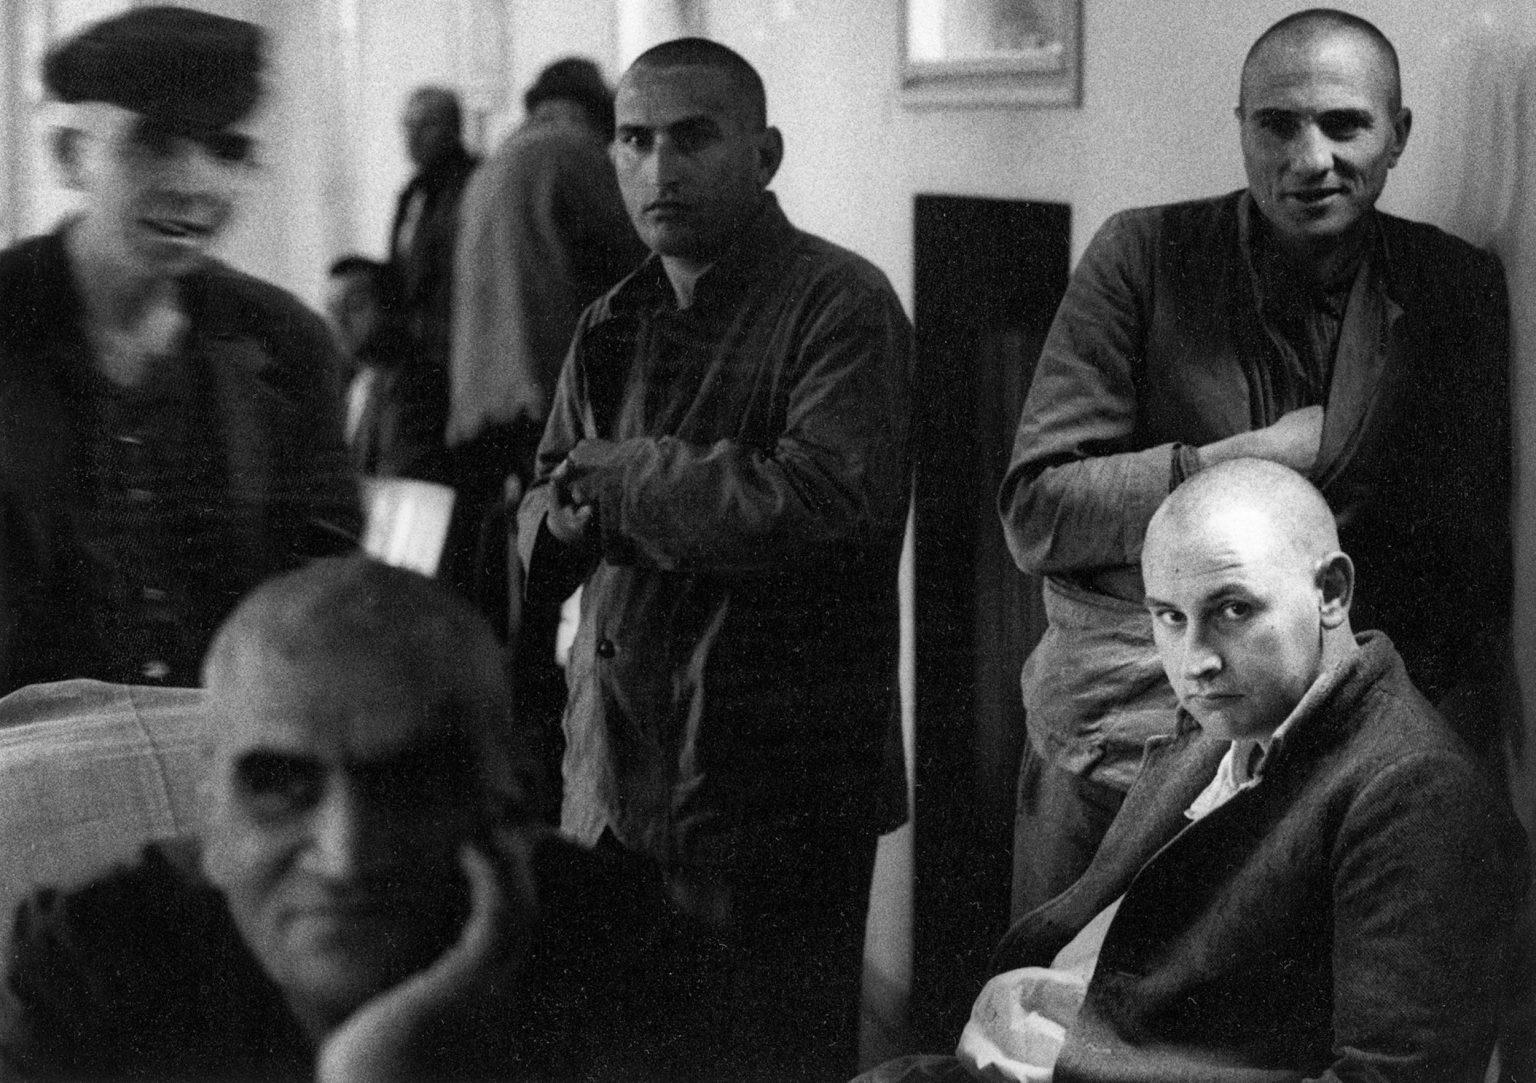 "Colorno (Parma), 1968-1969 - Male patients gathered inside a mental institution. ><  Colorno (Parma), 1968-1969 - Dei pazienti radunati all'interno dell'istituto psichiatrico.<p><span style=""color: #ff0000""><strong>*** SPECIAL   FEE   APPLIES ***</strong></span></p>"